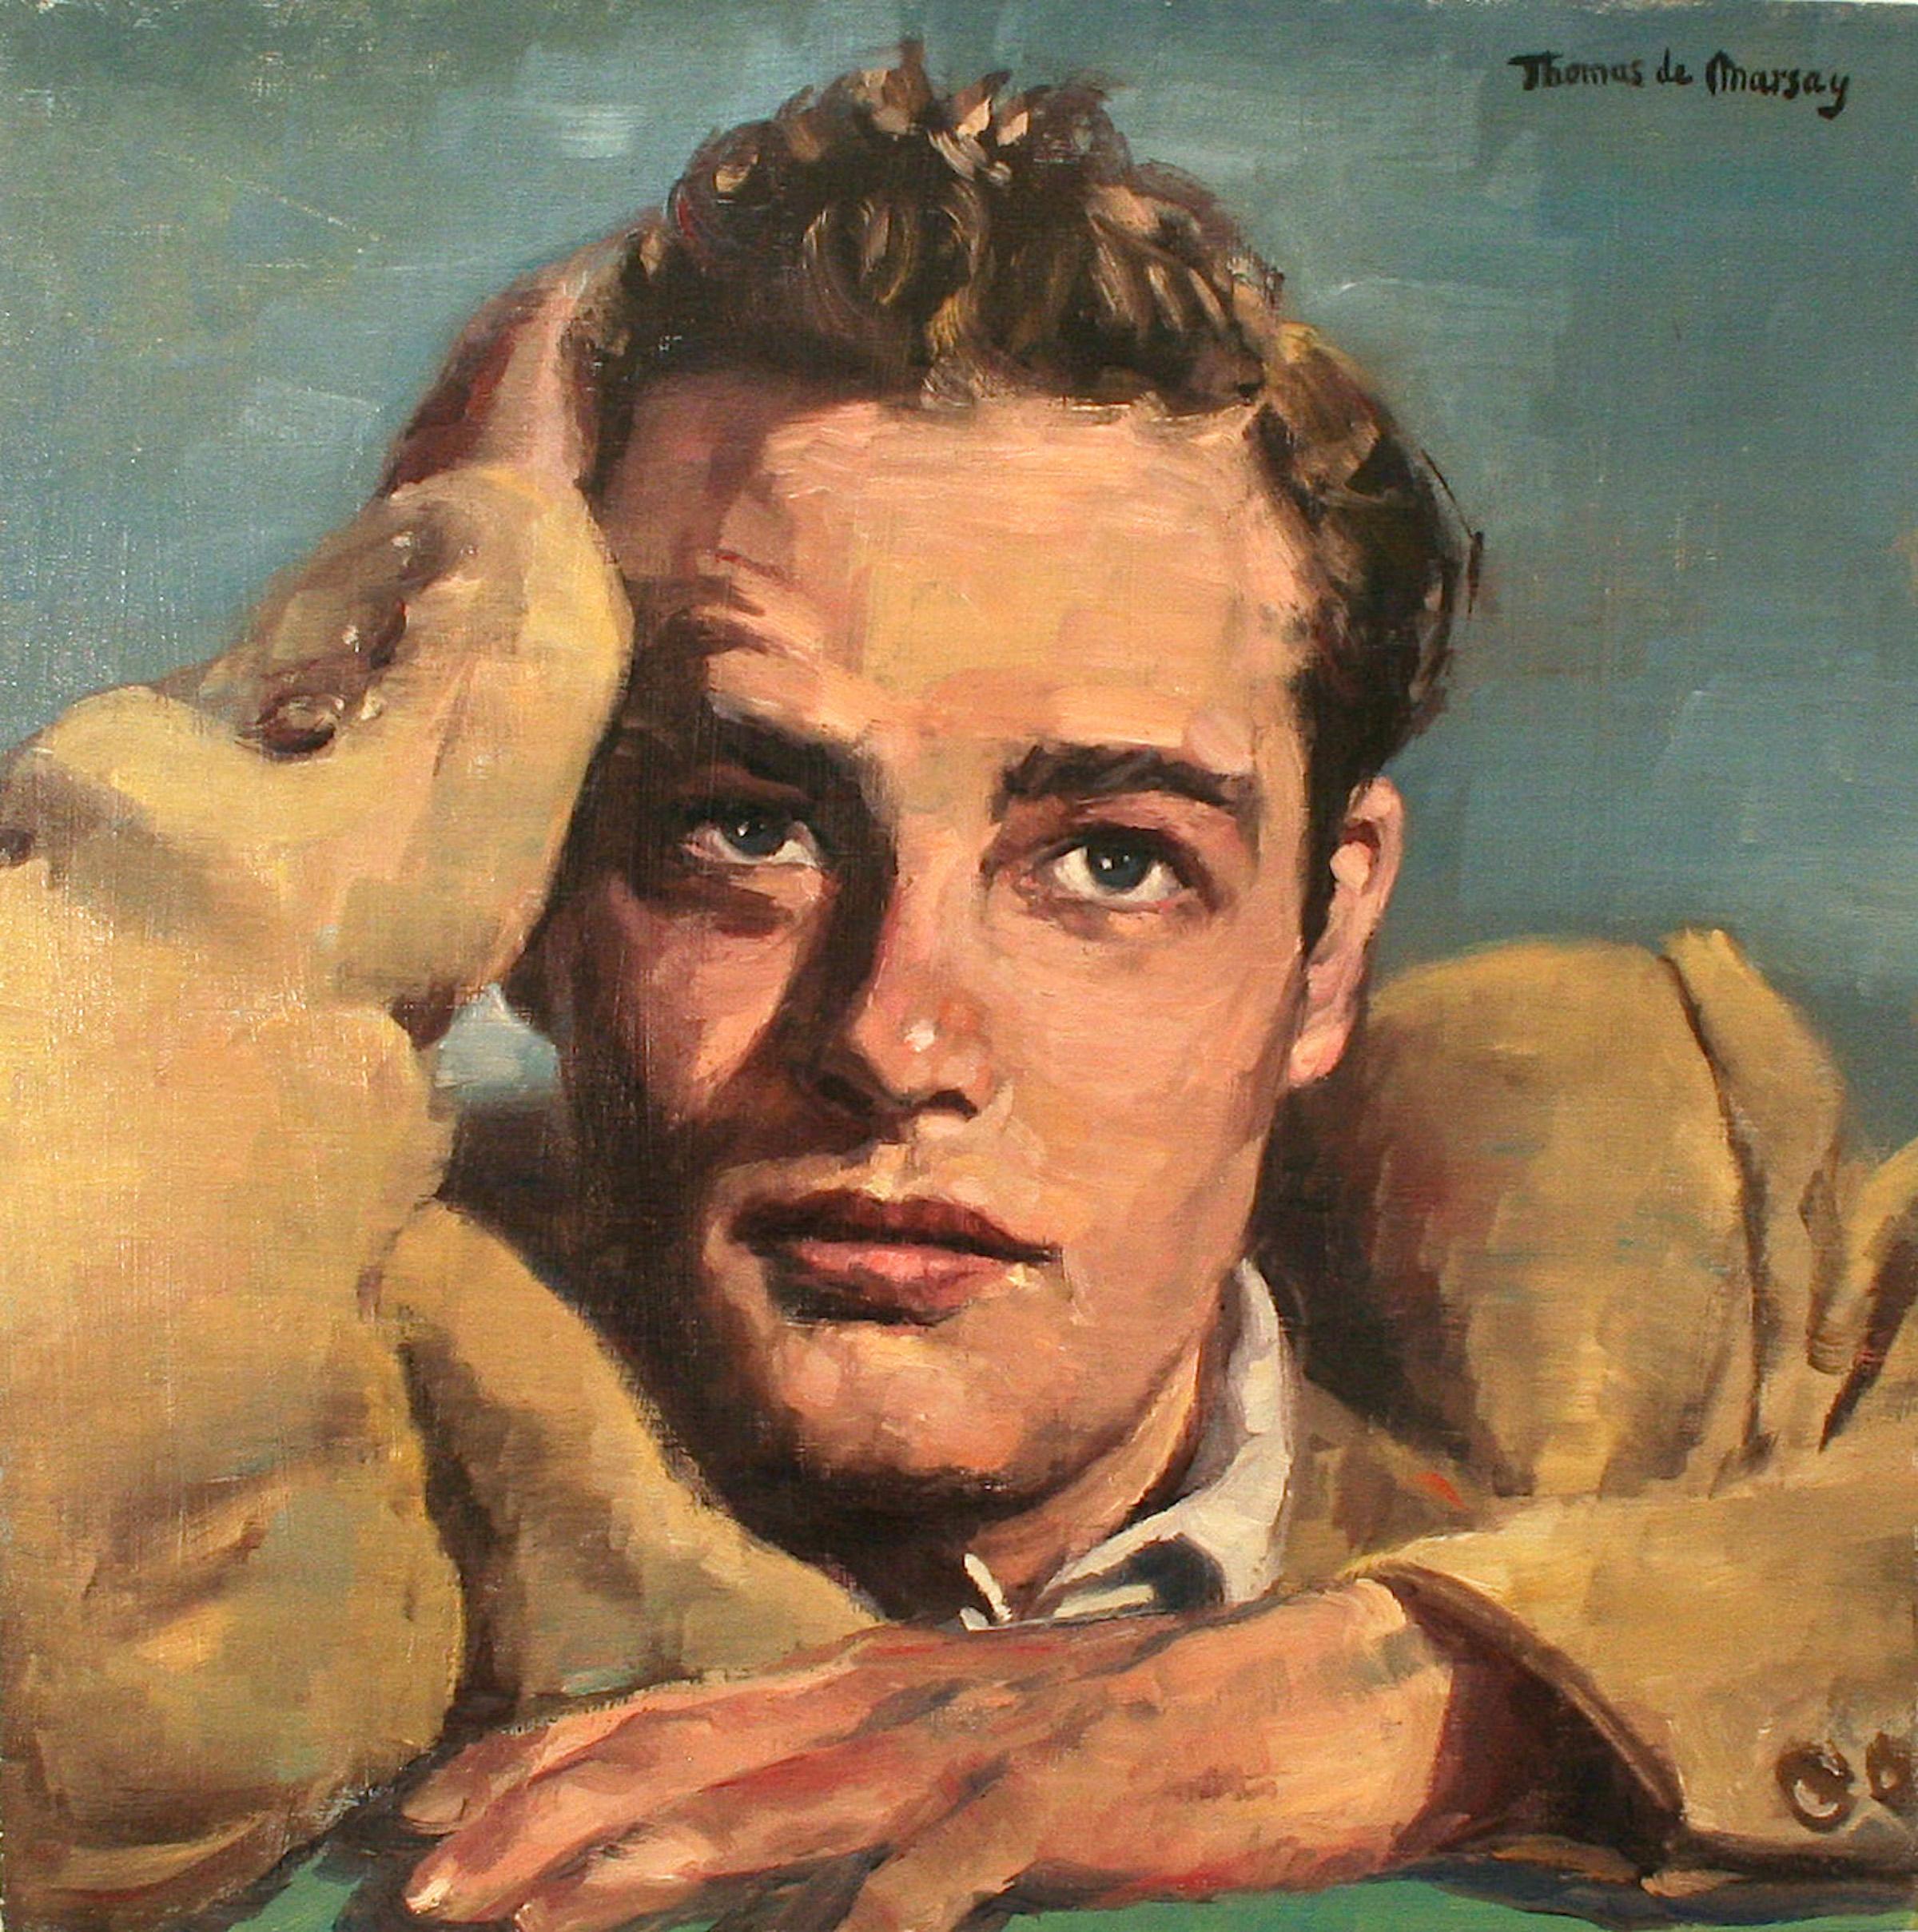 Dreaming. Marlon Brando.